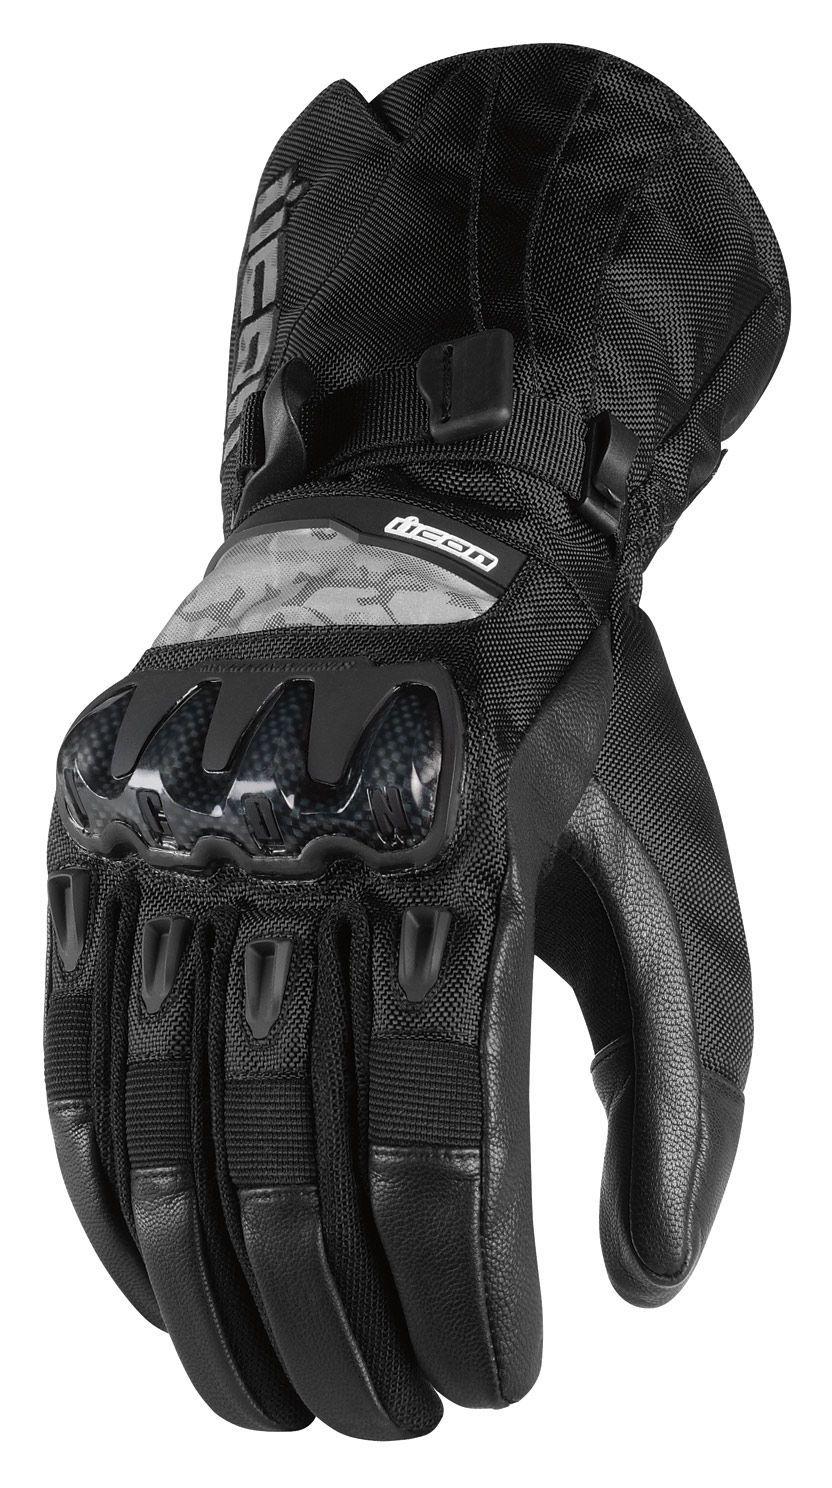 Zippertravel Waterproof gloves, Motorcycle gloves